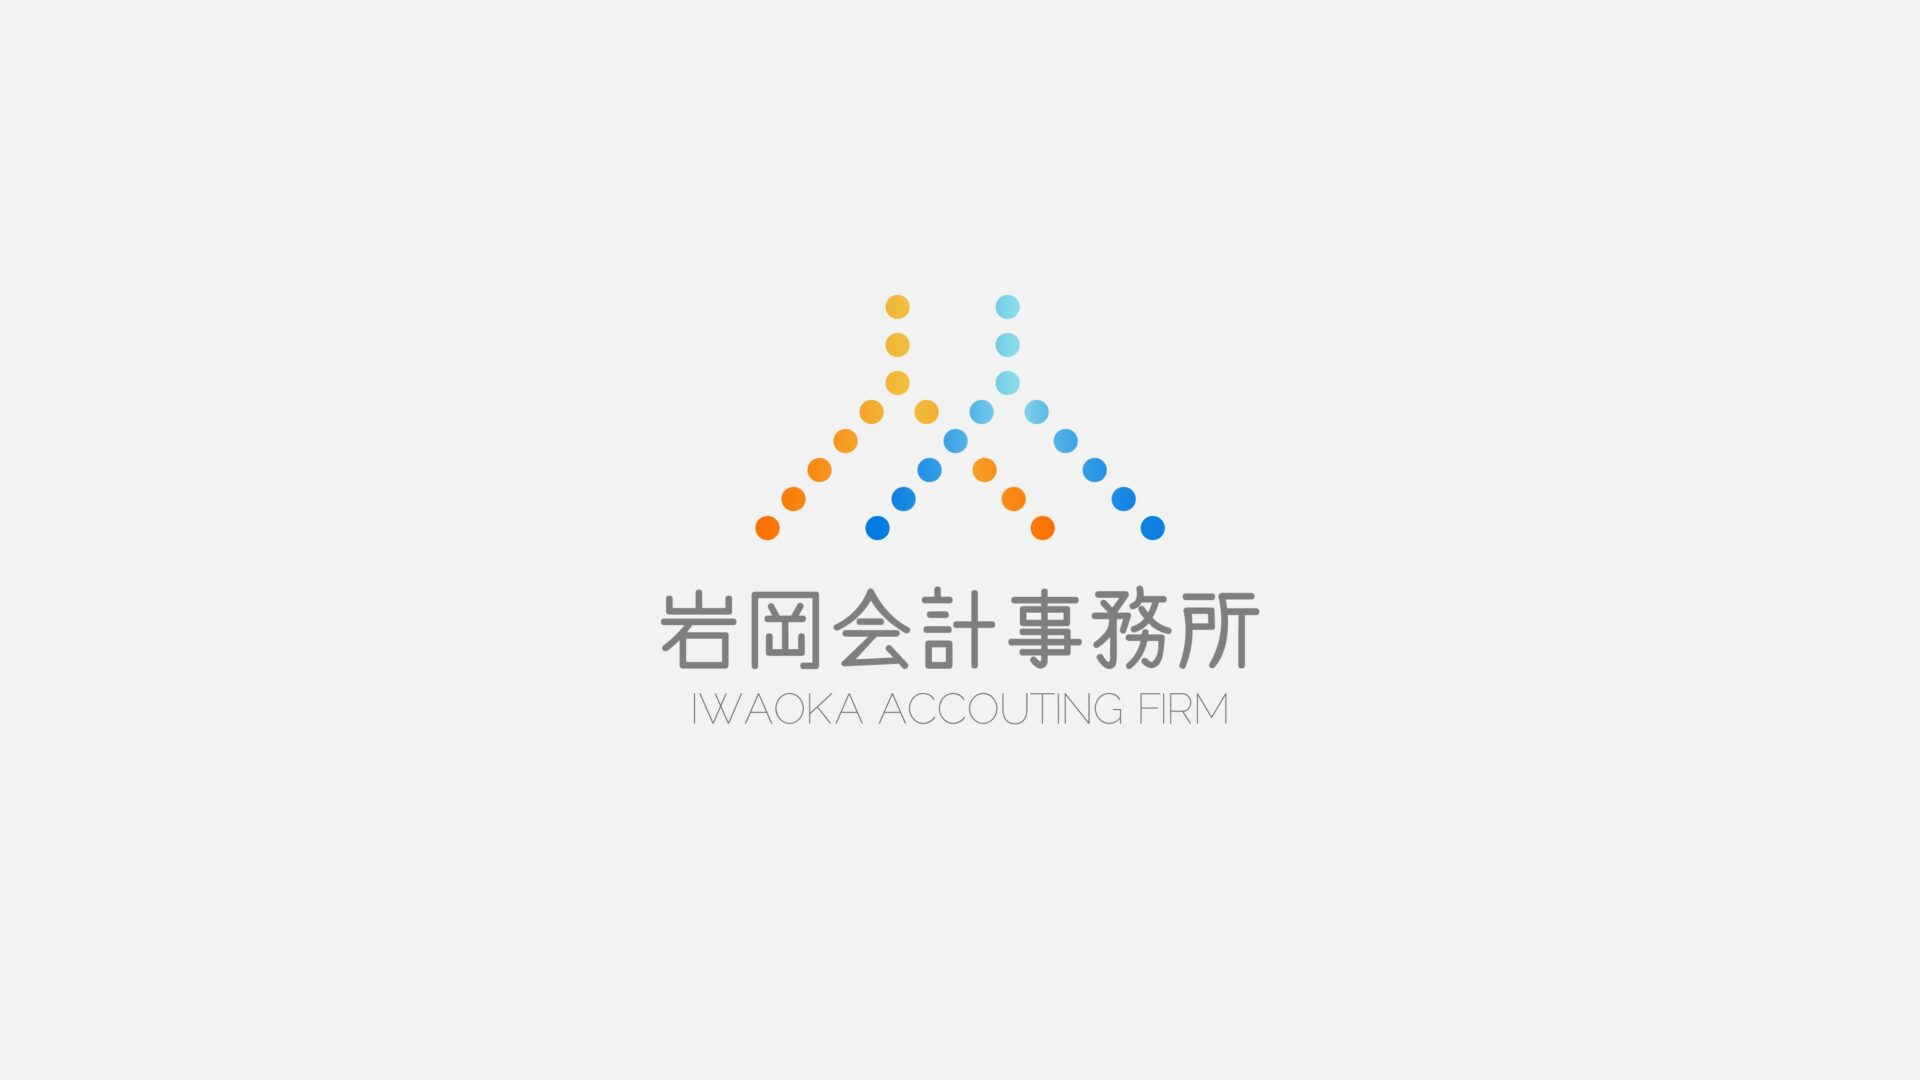 「IWAOKA ACCOUNTING FIRM」のサムネイル画像